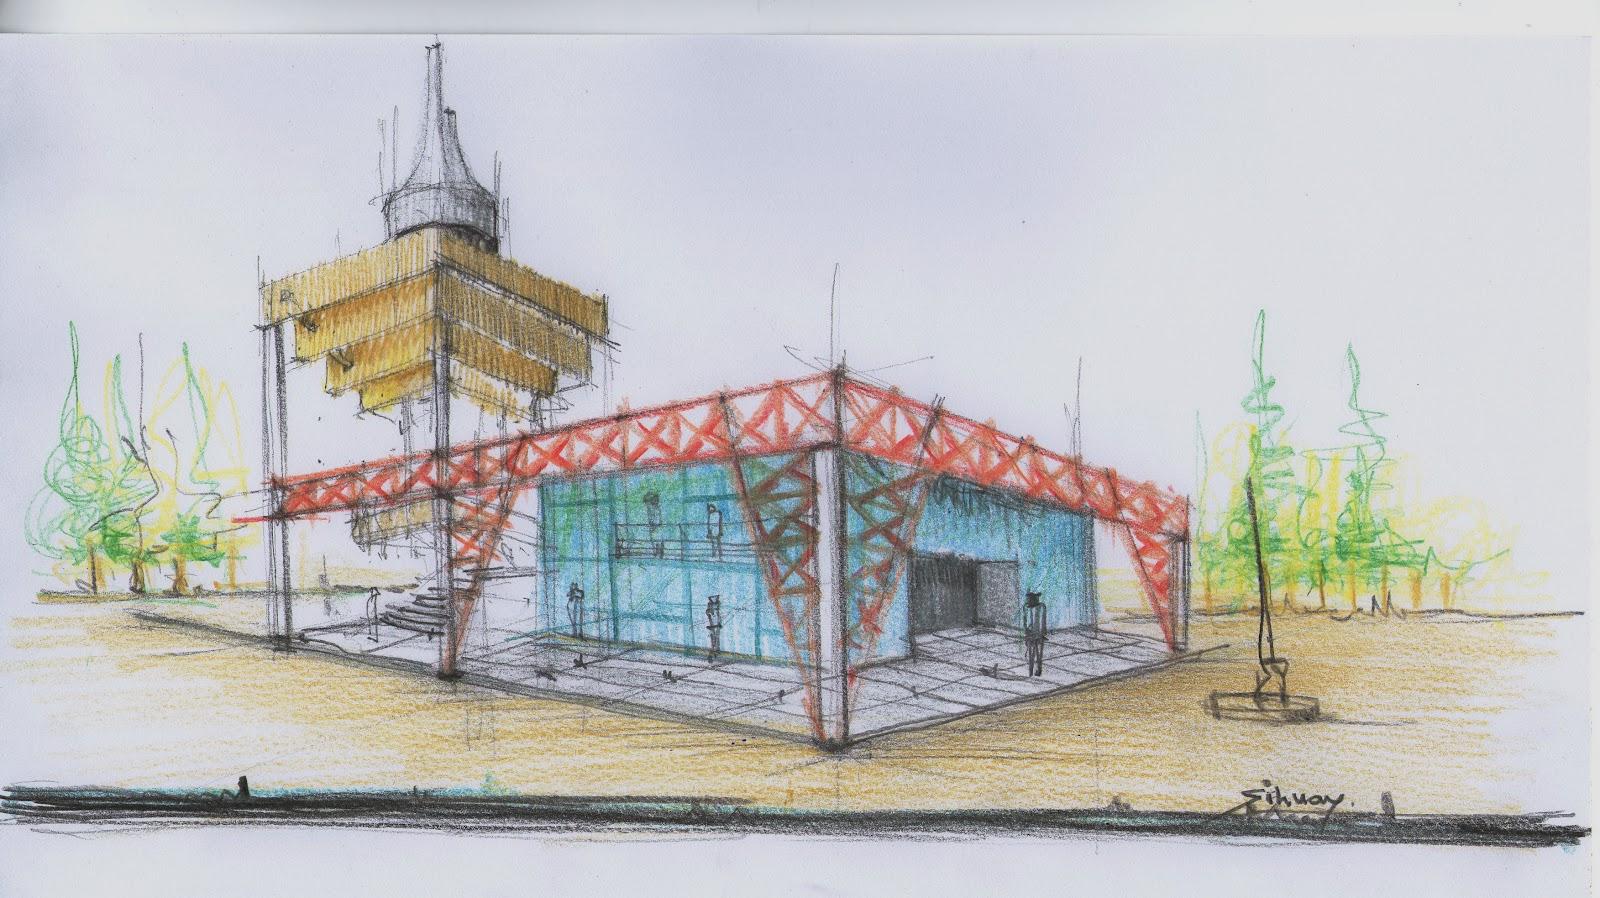 Taller josima 1 for Tecnicas de representacion arquitectonica pdf